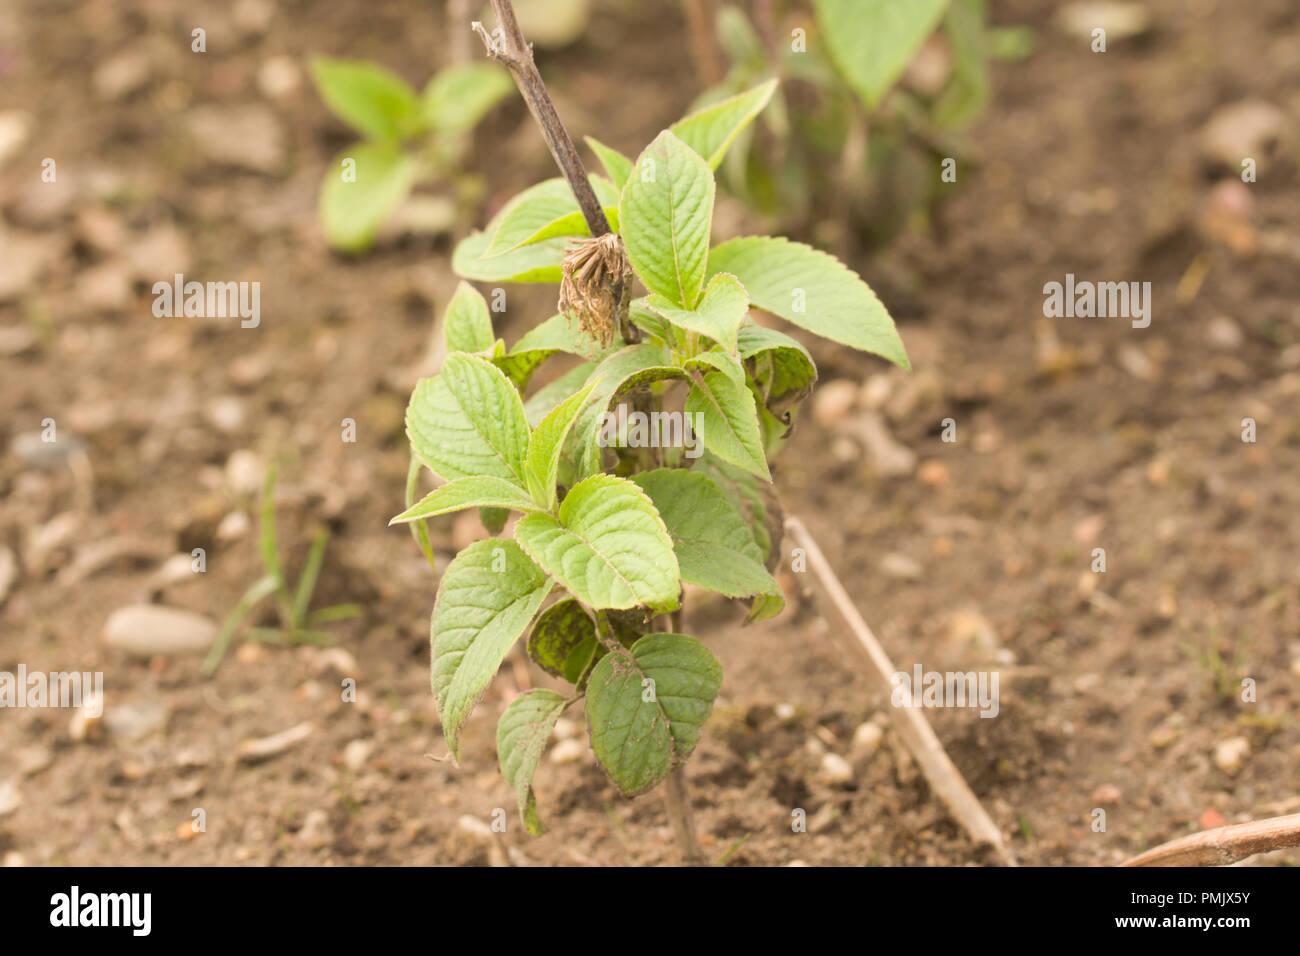 Monarda fistulosathe wild bergamot or bee balm, is a wildflower in the mint family (Lamiaceae) - Stock Image